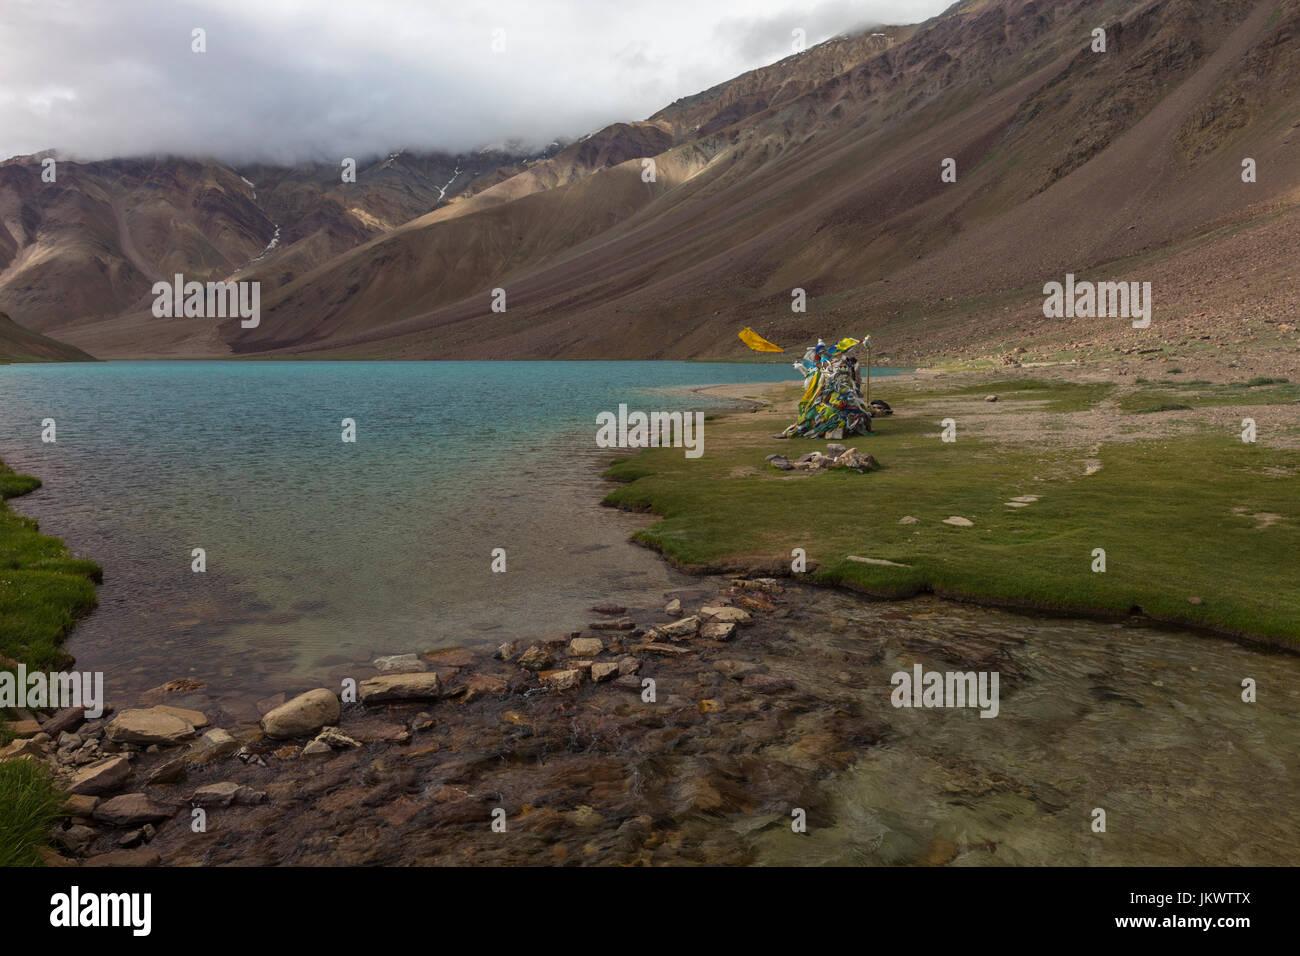 Chandra Taal Lake - Stock Image